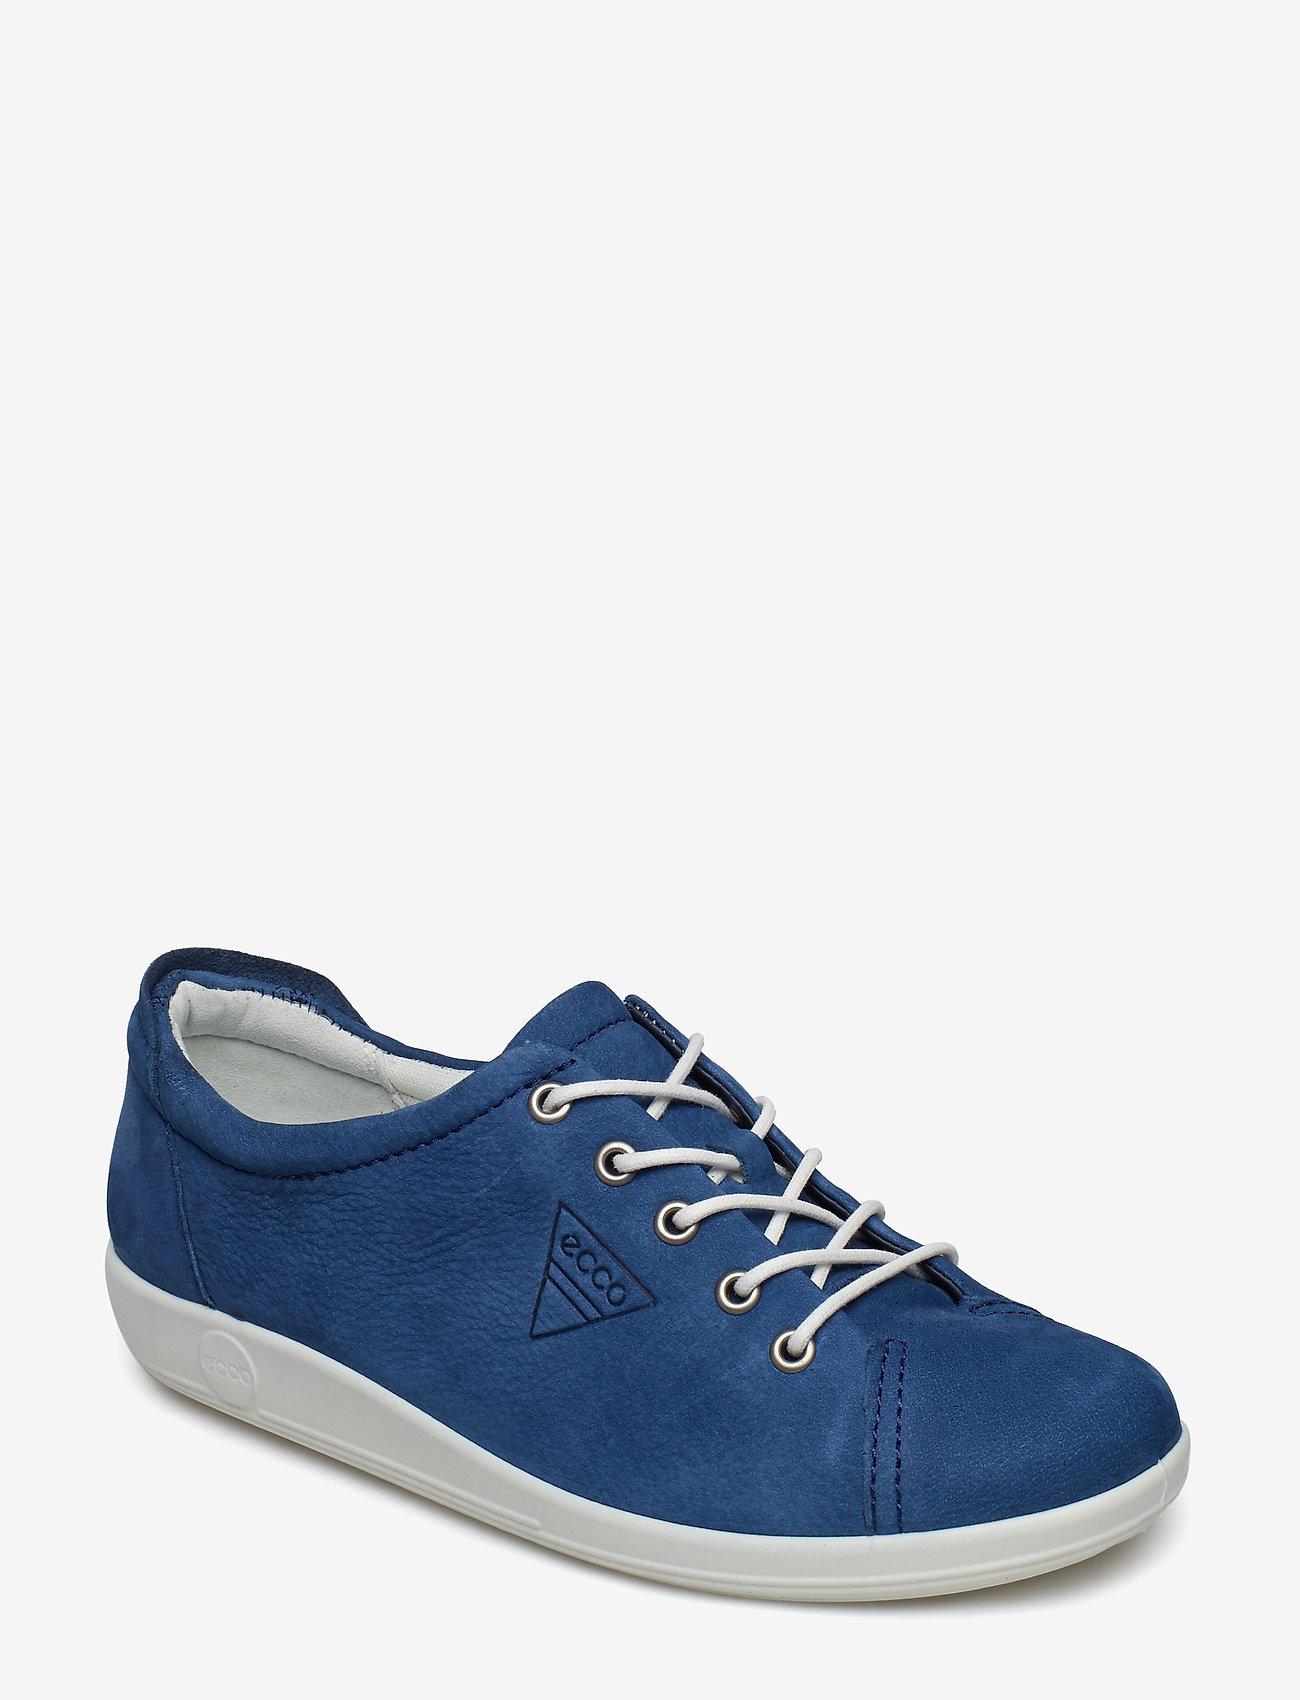 ECCO - SOFT 2.0 - låga sneakers - true navy - 0